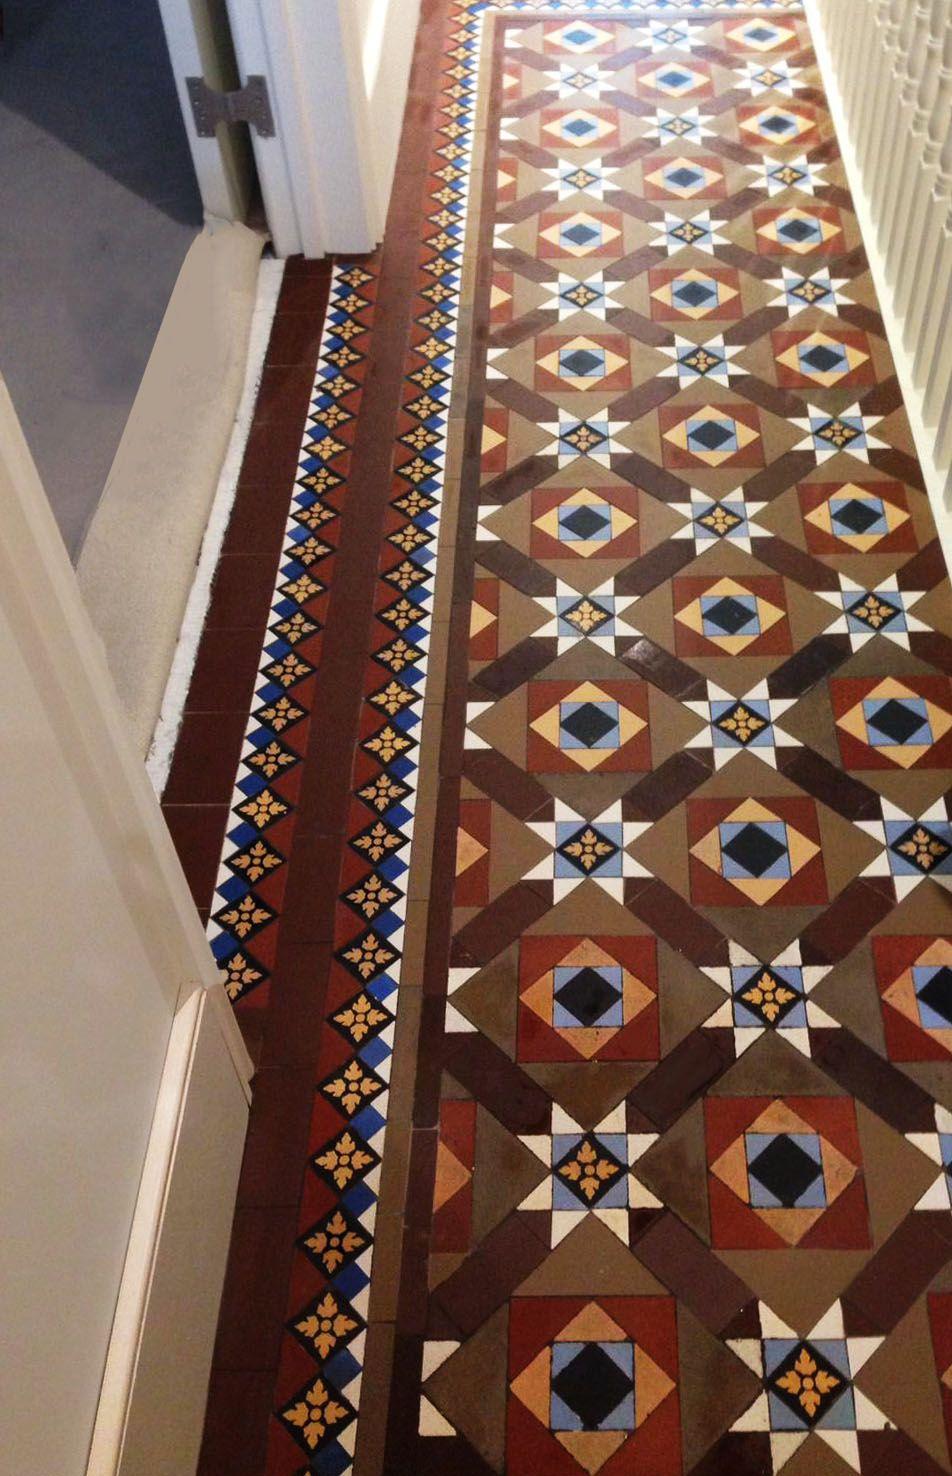 London Mosaic Victorian Tiles In 2020 Victorian Mosaic Tile Victorian Hallway Tiles Porch Tile